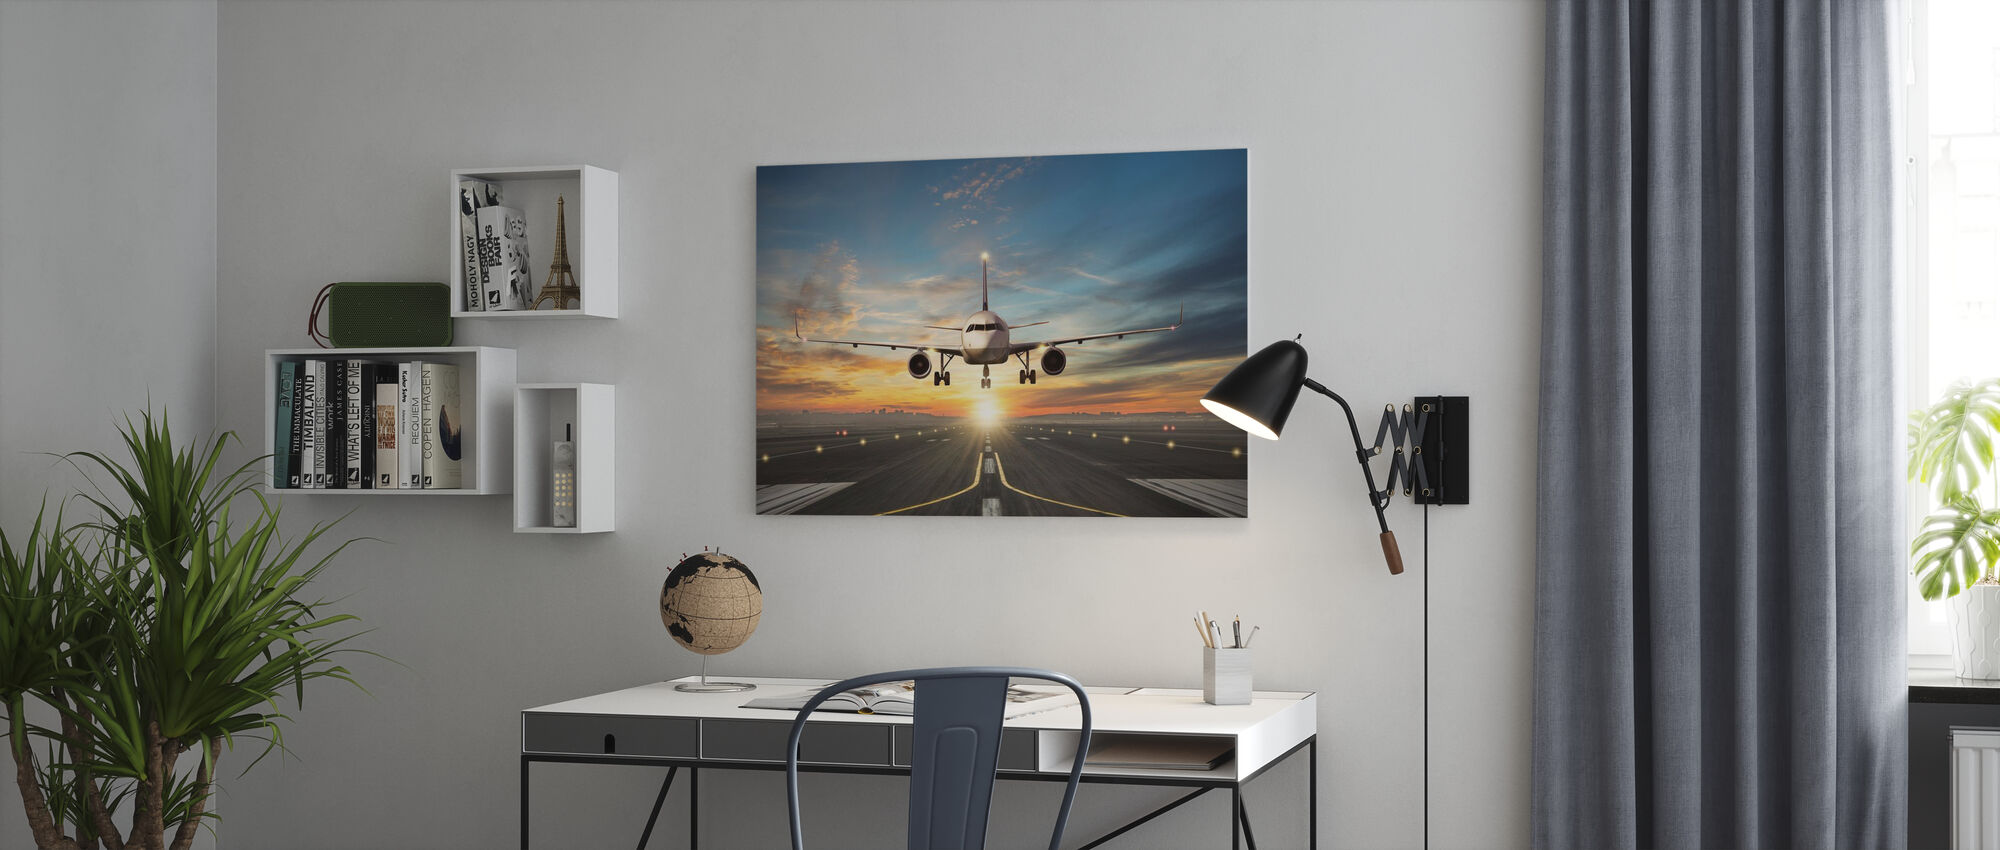 Sunset Inflight - Canvas print - Office